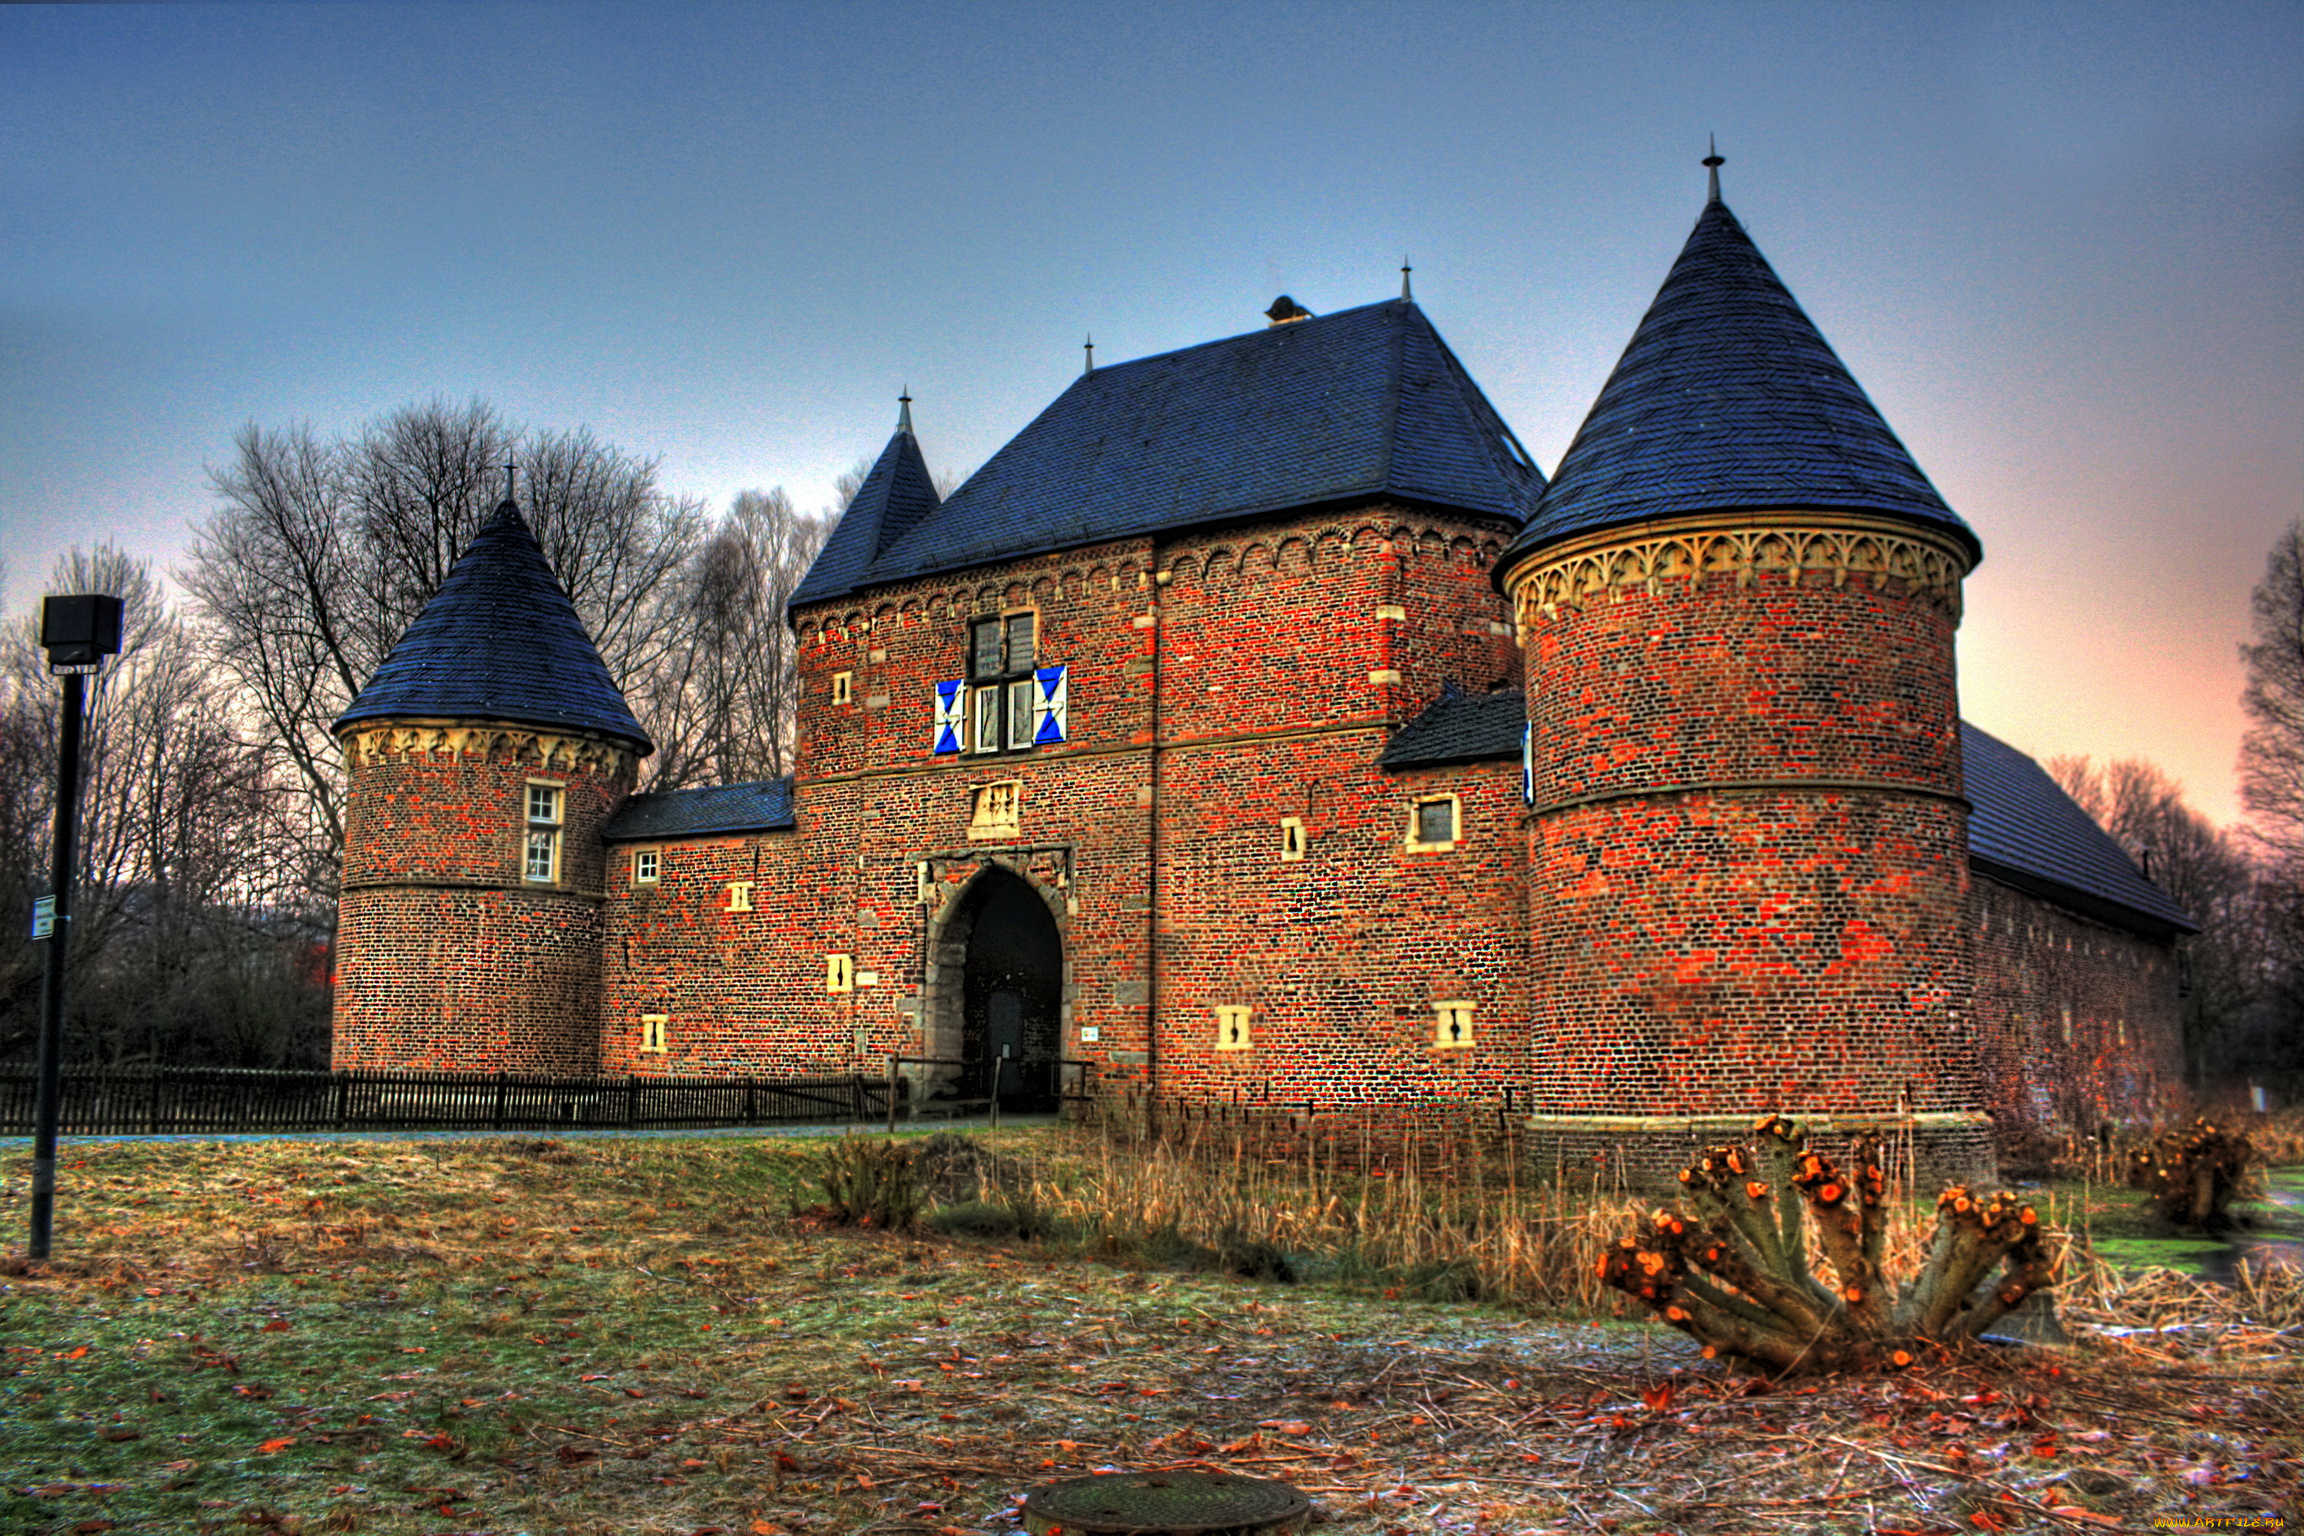 download 1600x1200 wallpaper germany burg vondern hdri castles cities 2304x1536 download 2304x1536 file burg